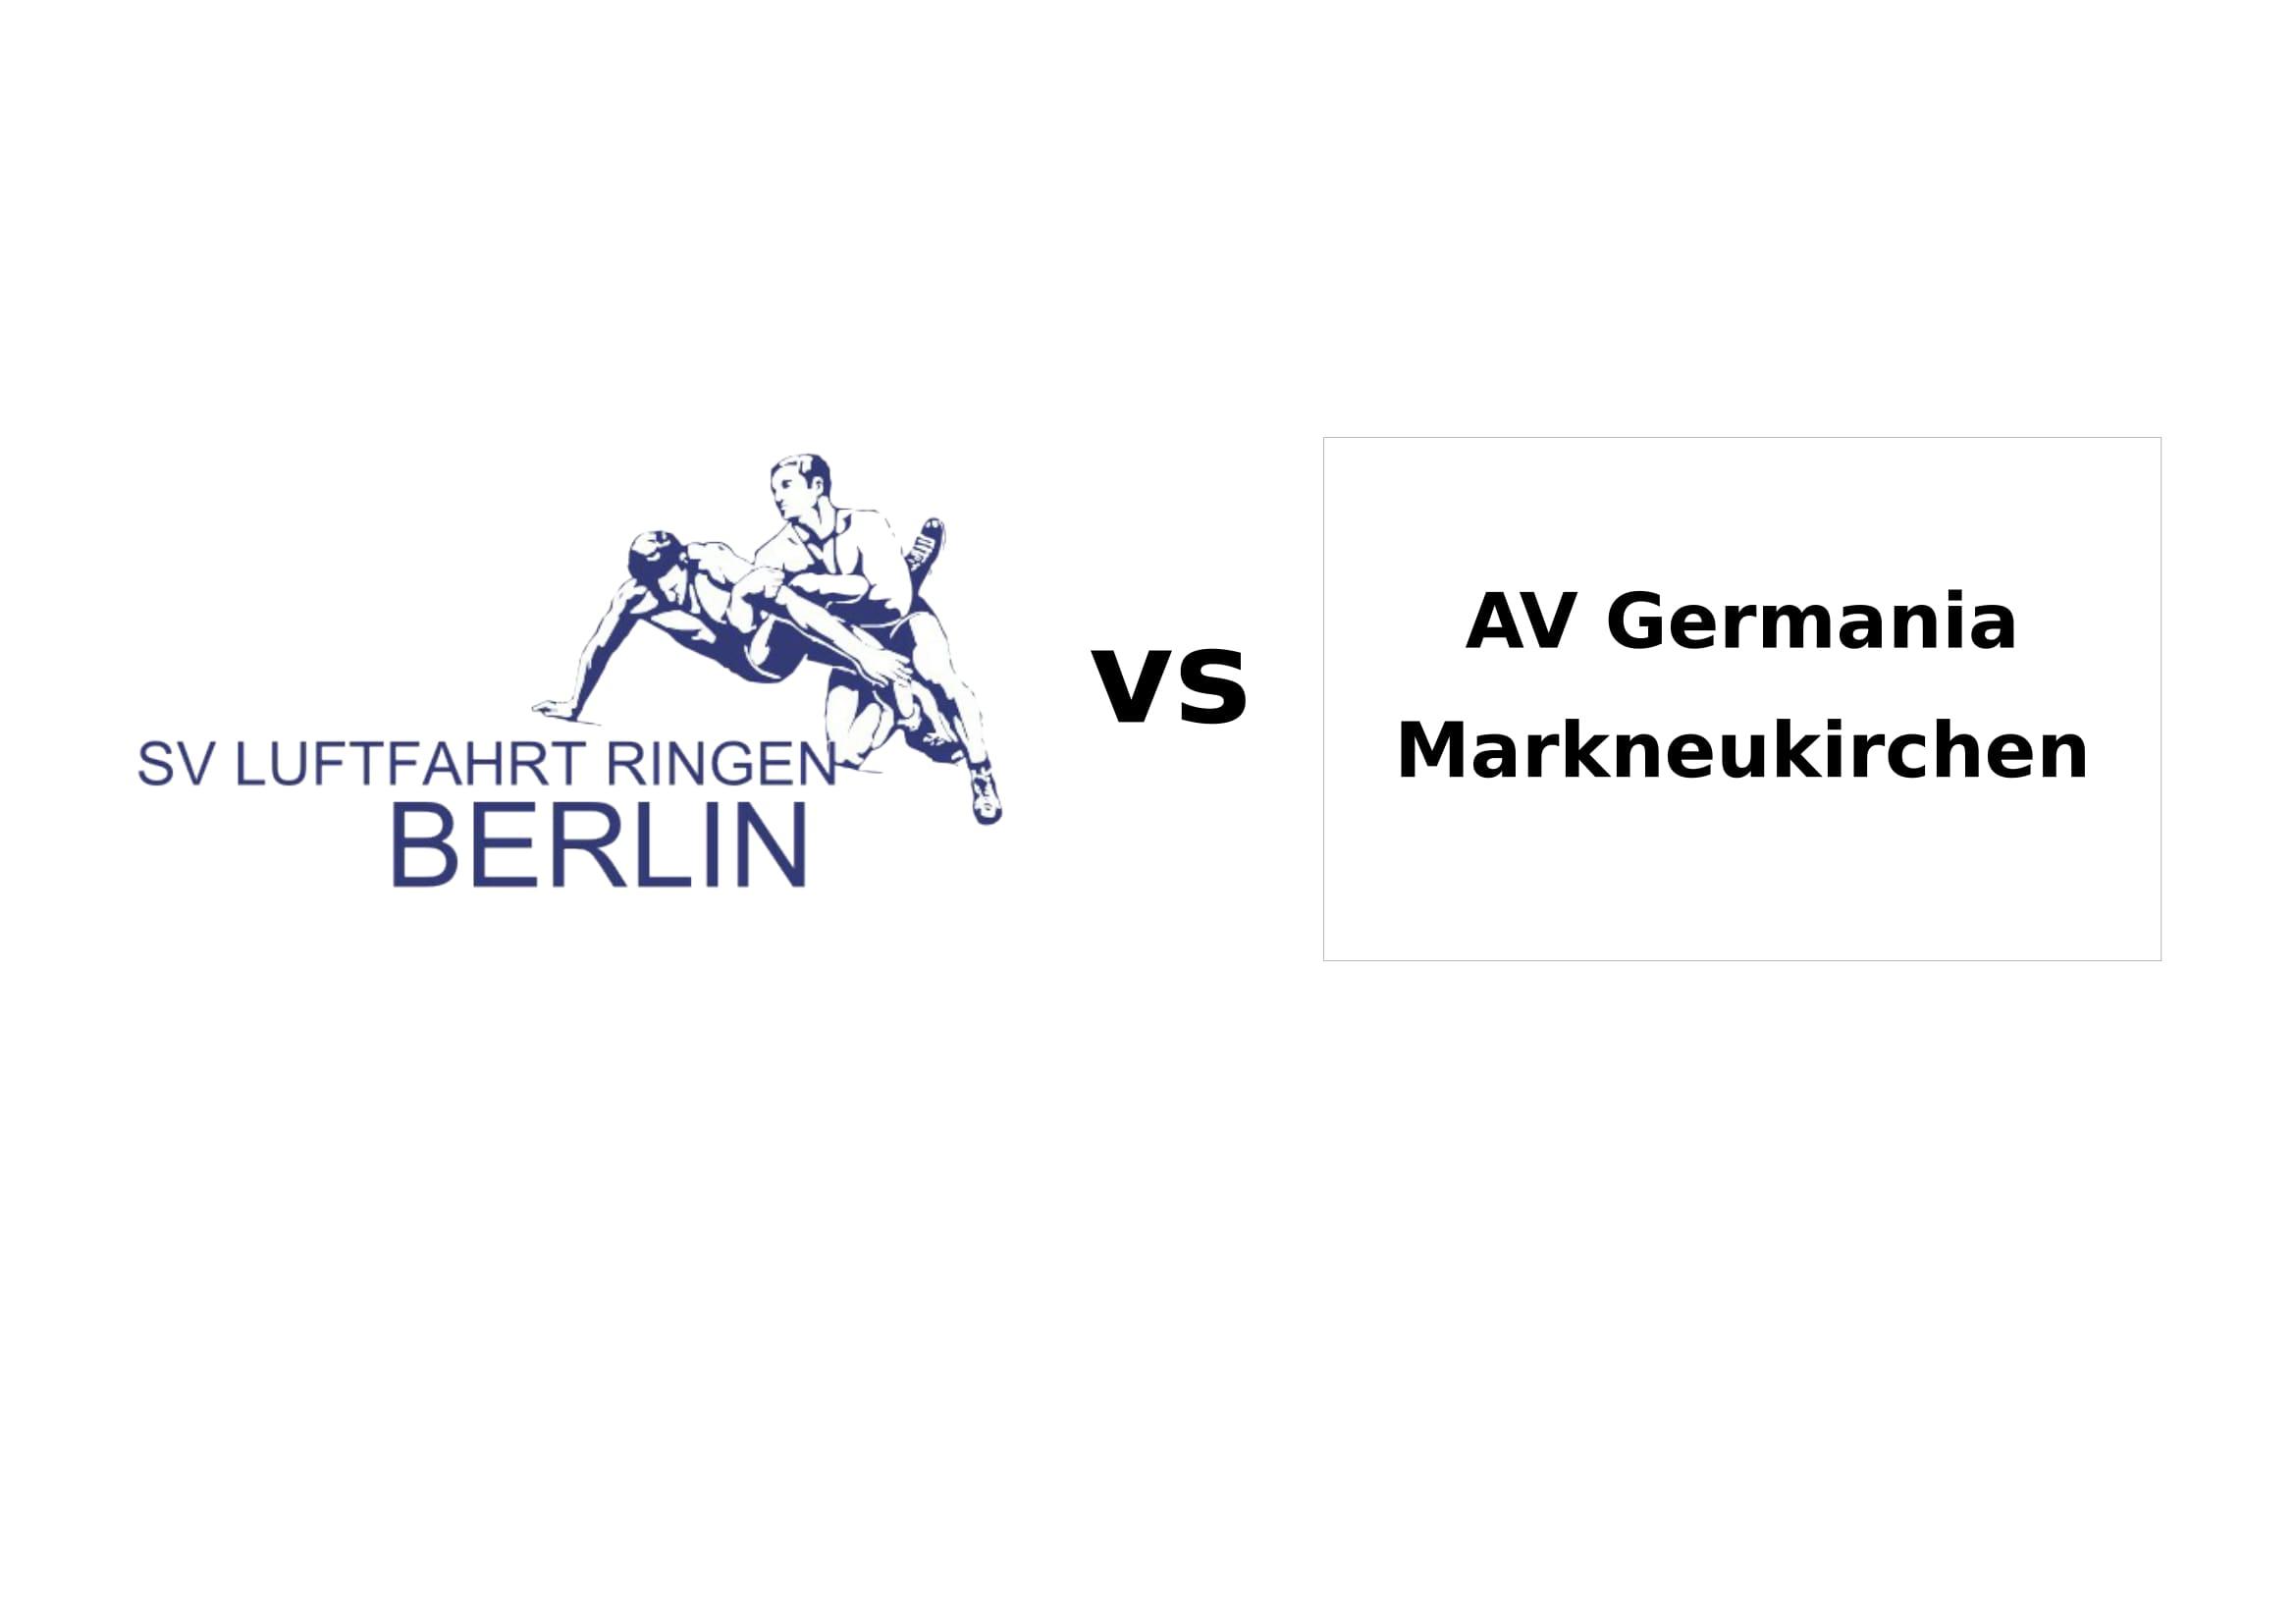 RL-Heimkampf SVL vs. AVG Markneukirchen